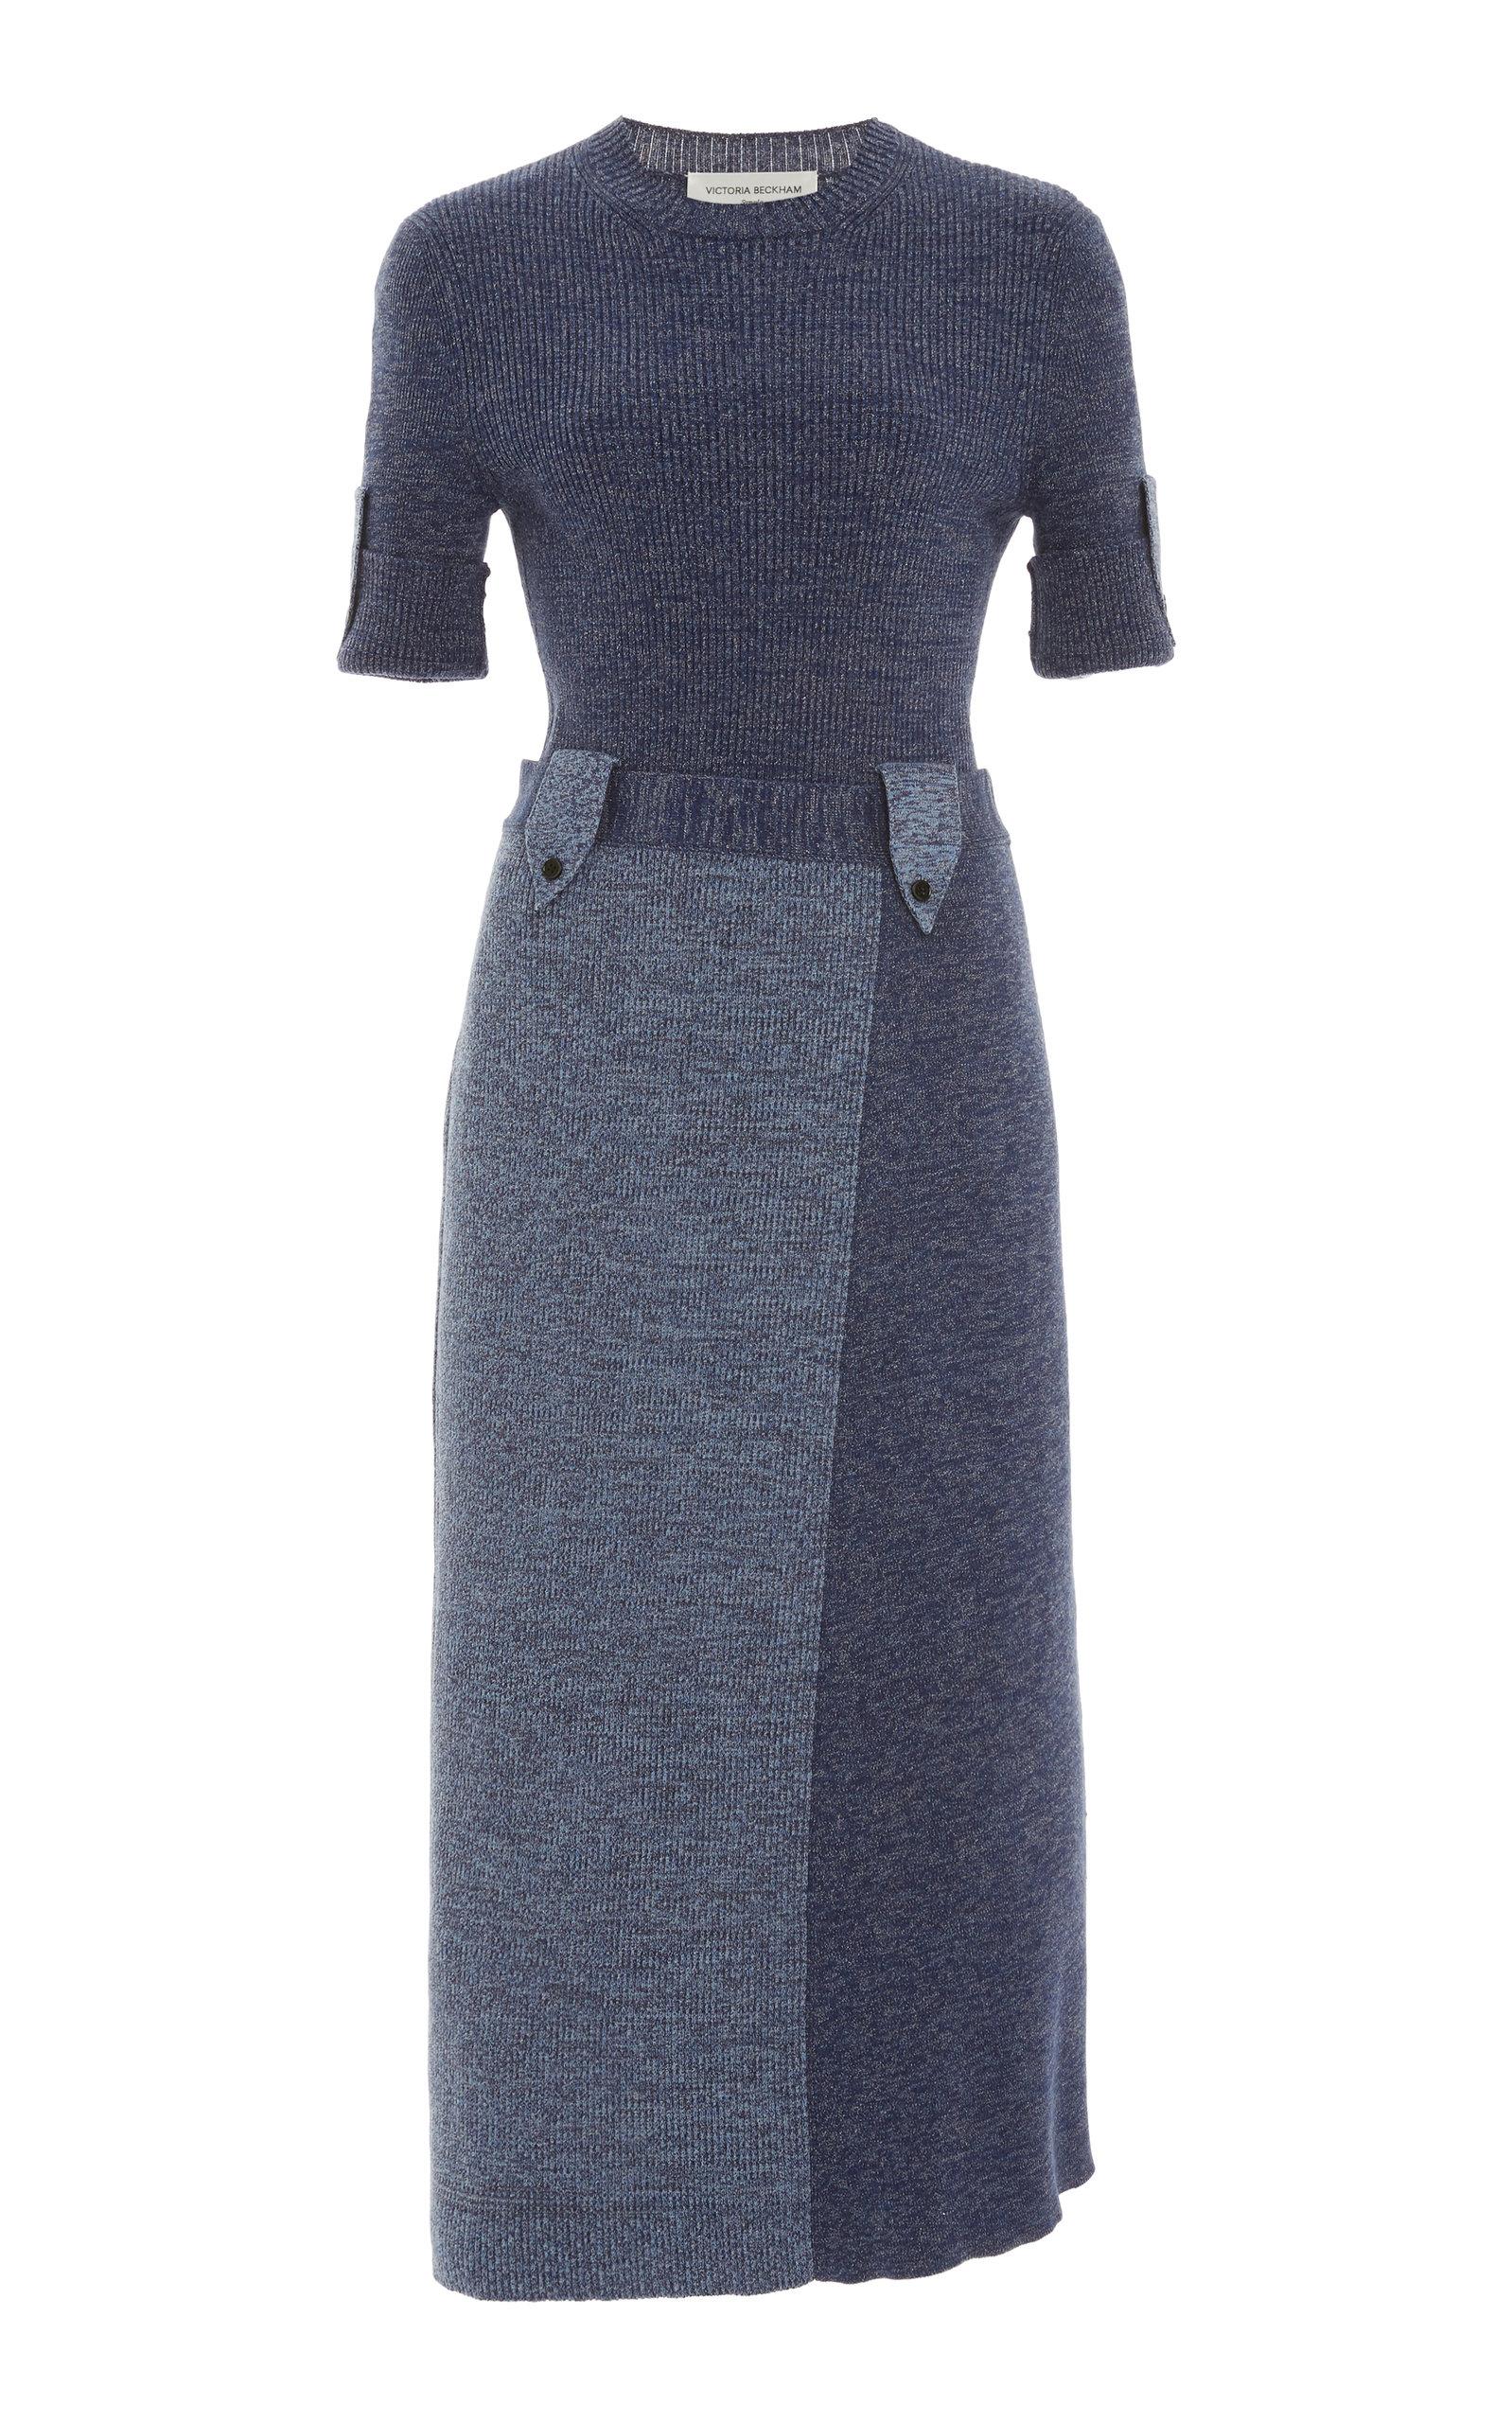 Victoria Beckham Cotton Military Dress In Multi